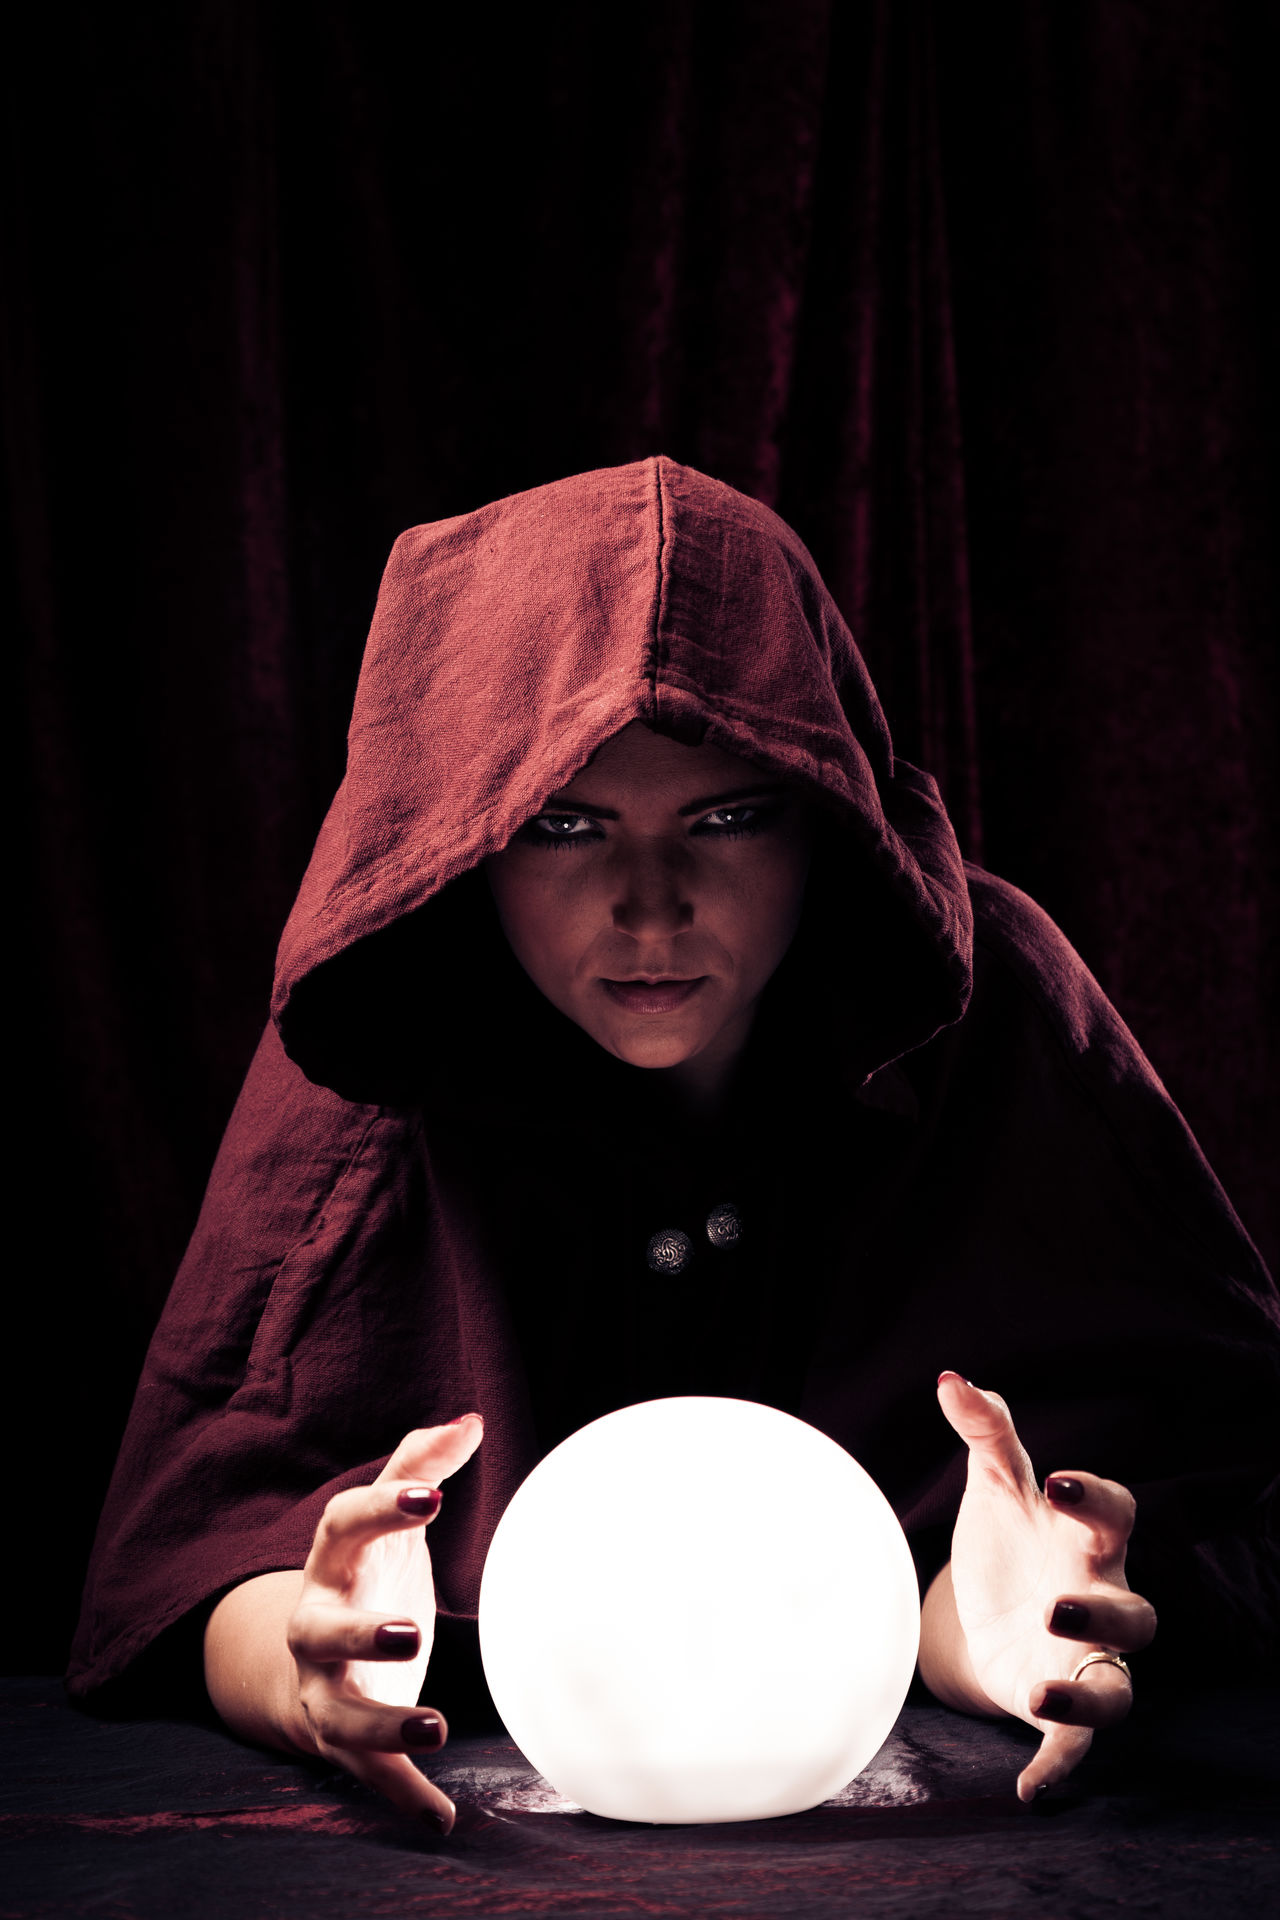 Studio shot of fortune teller. Crystal Crystal Ball Forecast Fortune Teller Fortune Telling Future Hood Magic Paranormal Portrait Psychic Medium Red Spooky Studio Shot Vision Woman Women Young Women